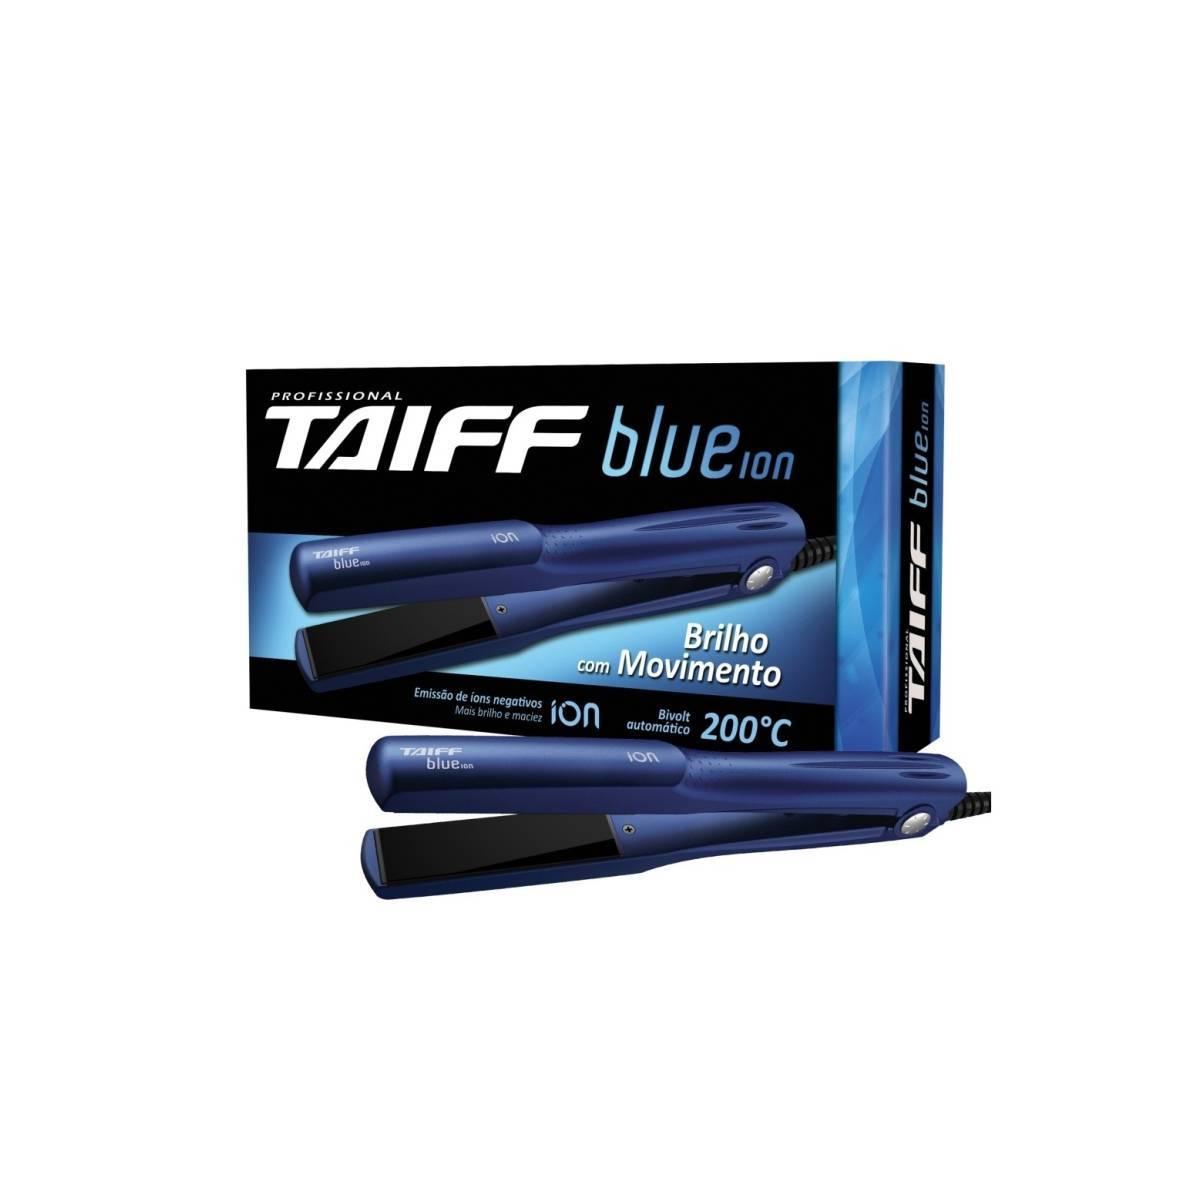 Chapa/Prancha Taiff Blue Íon